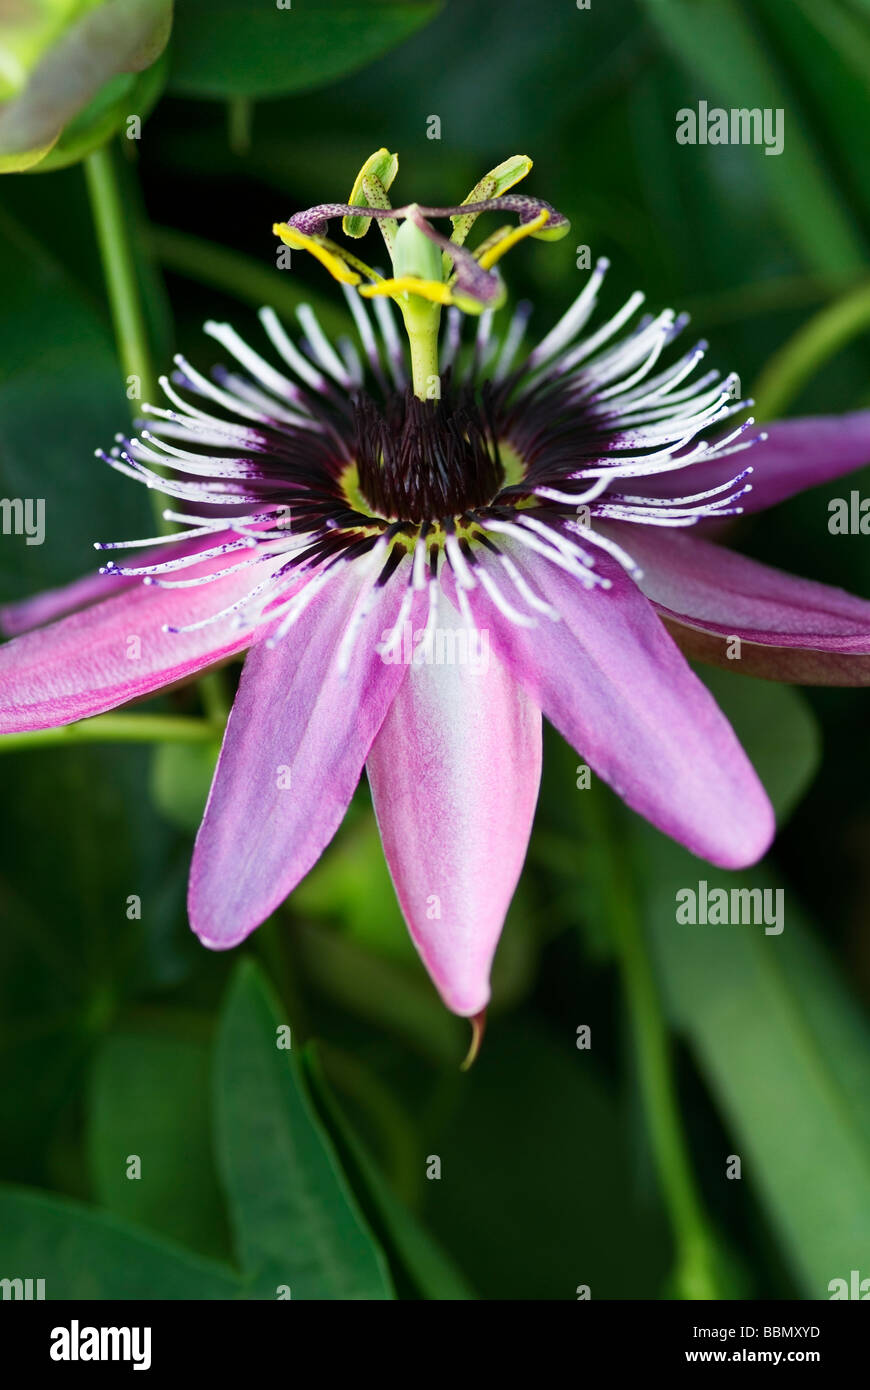 close up portrait of passiflora caerulea x racemosa